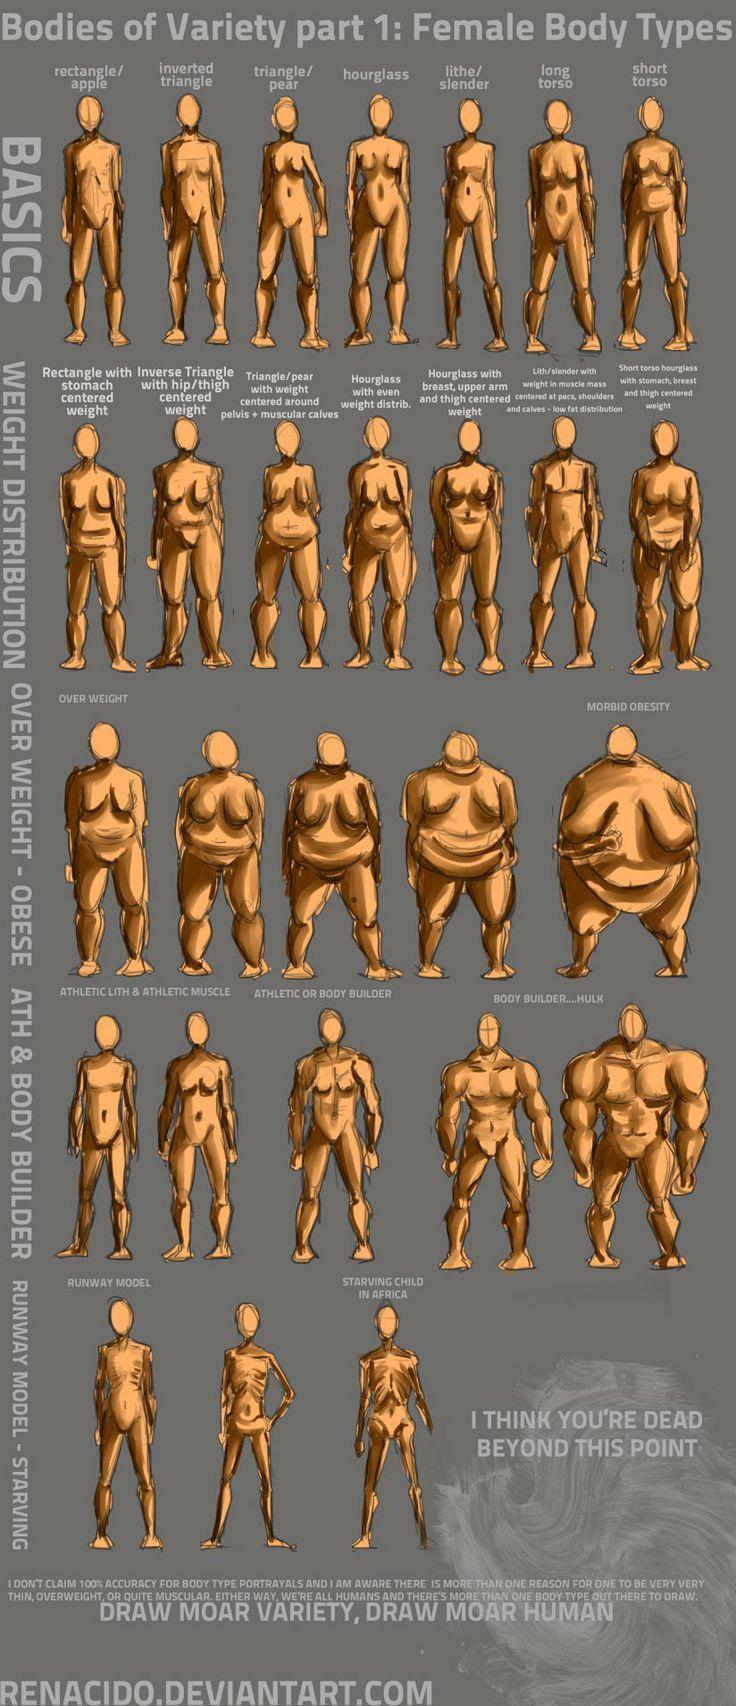 bodies_of_variety_pt_1__female_body_types_by_renacido-d4qmhbh http://pipocacombacon.wordpress.com/2014/02/20/aprenda-a-desenhar-2-corpo-humano/#more-4735